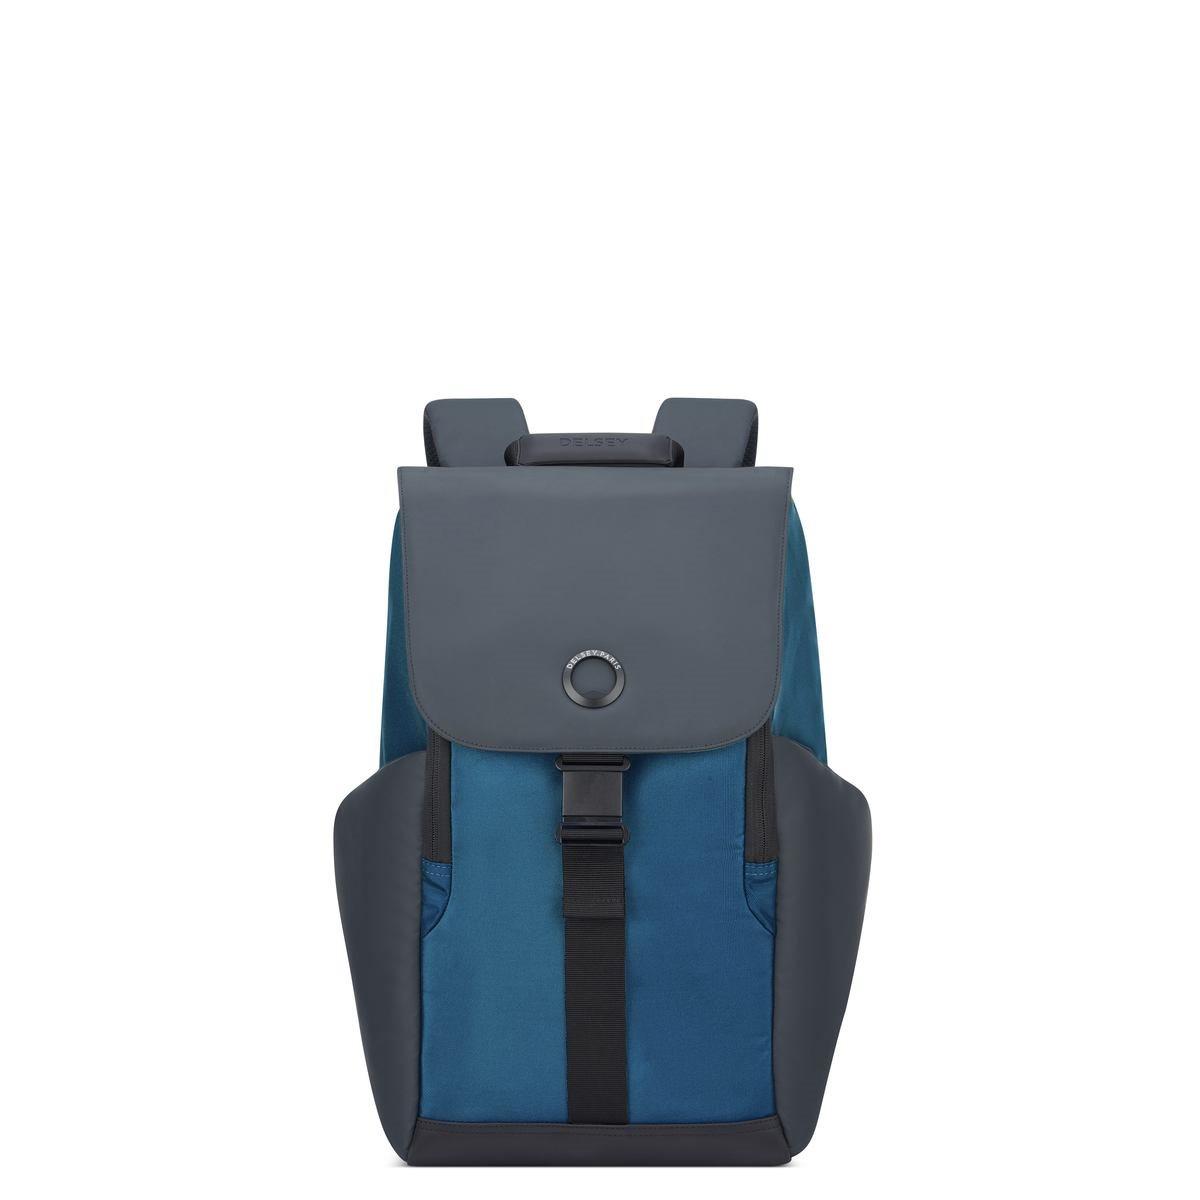 Delsey Σακίδιο πλάτης με θέση PC 15,6'' 45,5x31,5x14,5cm σειρά Securflap Blue